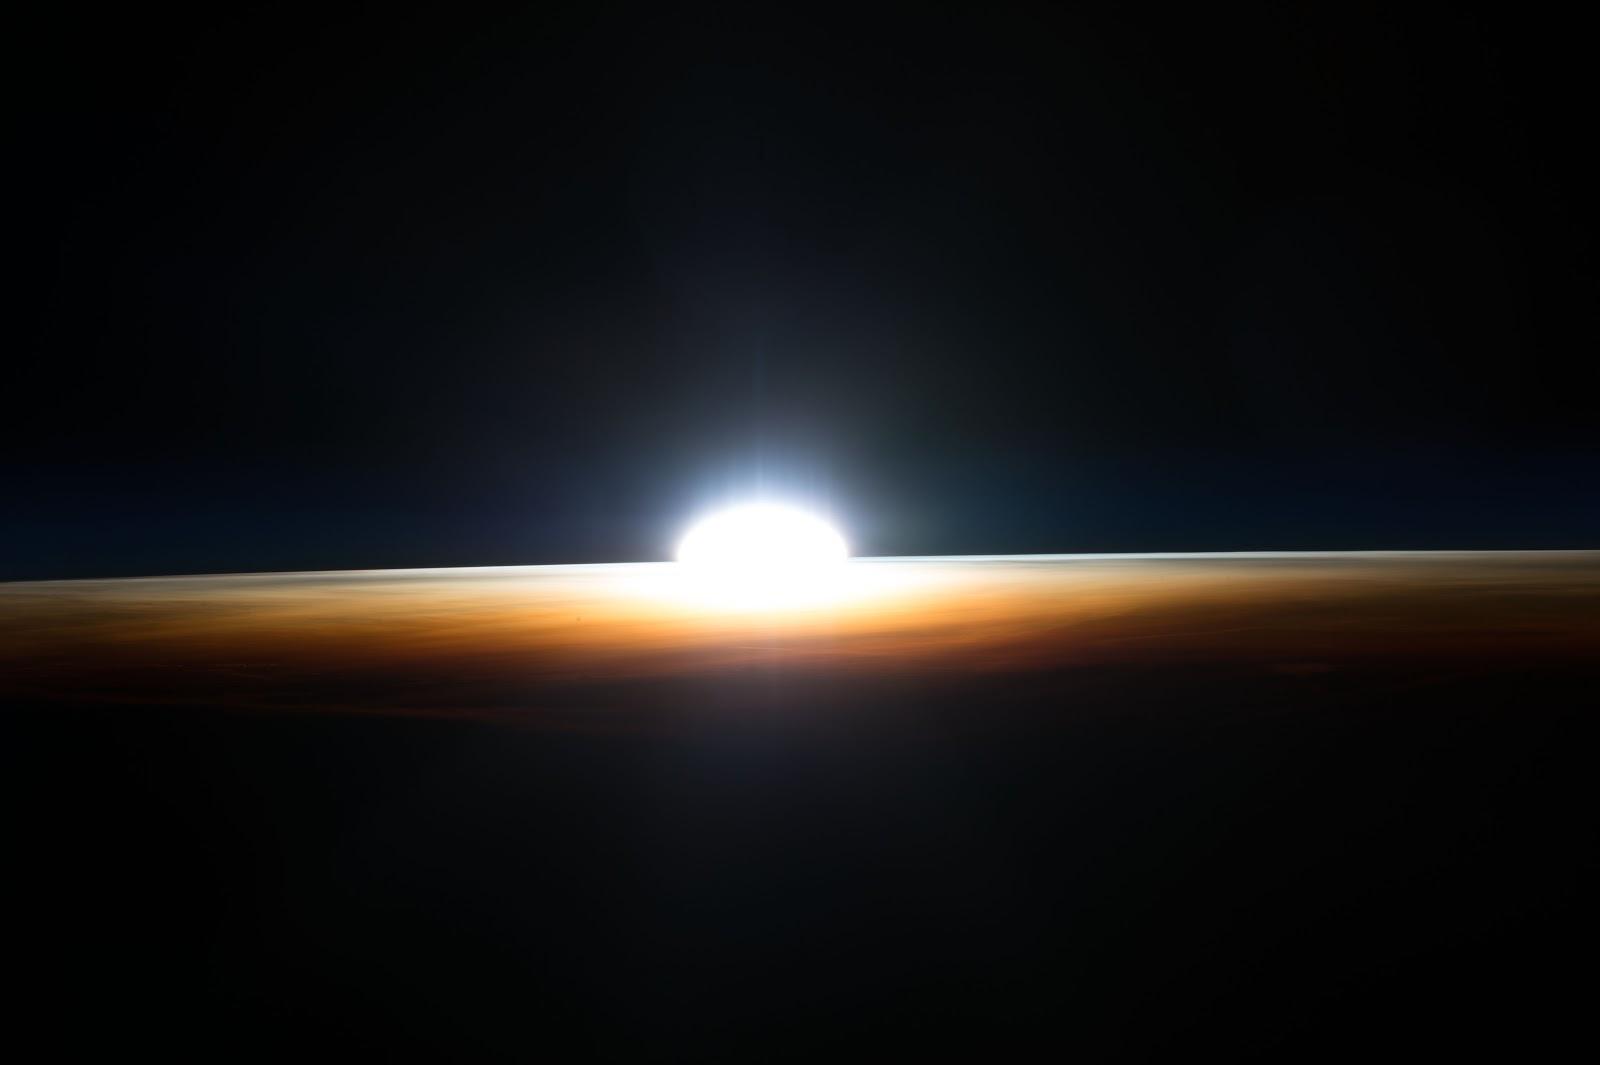 sunrise from international space station - photo #38